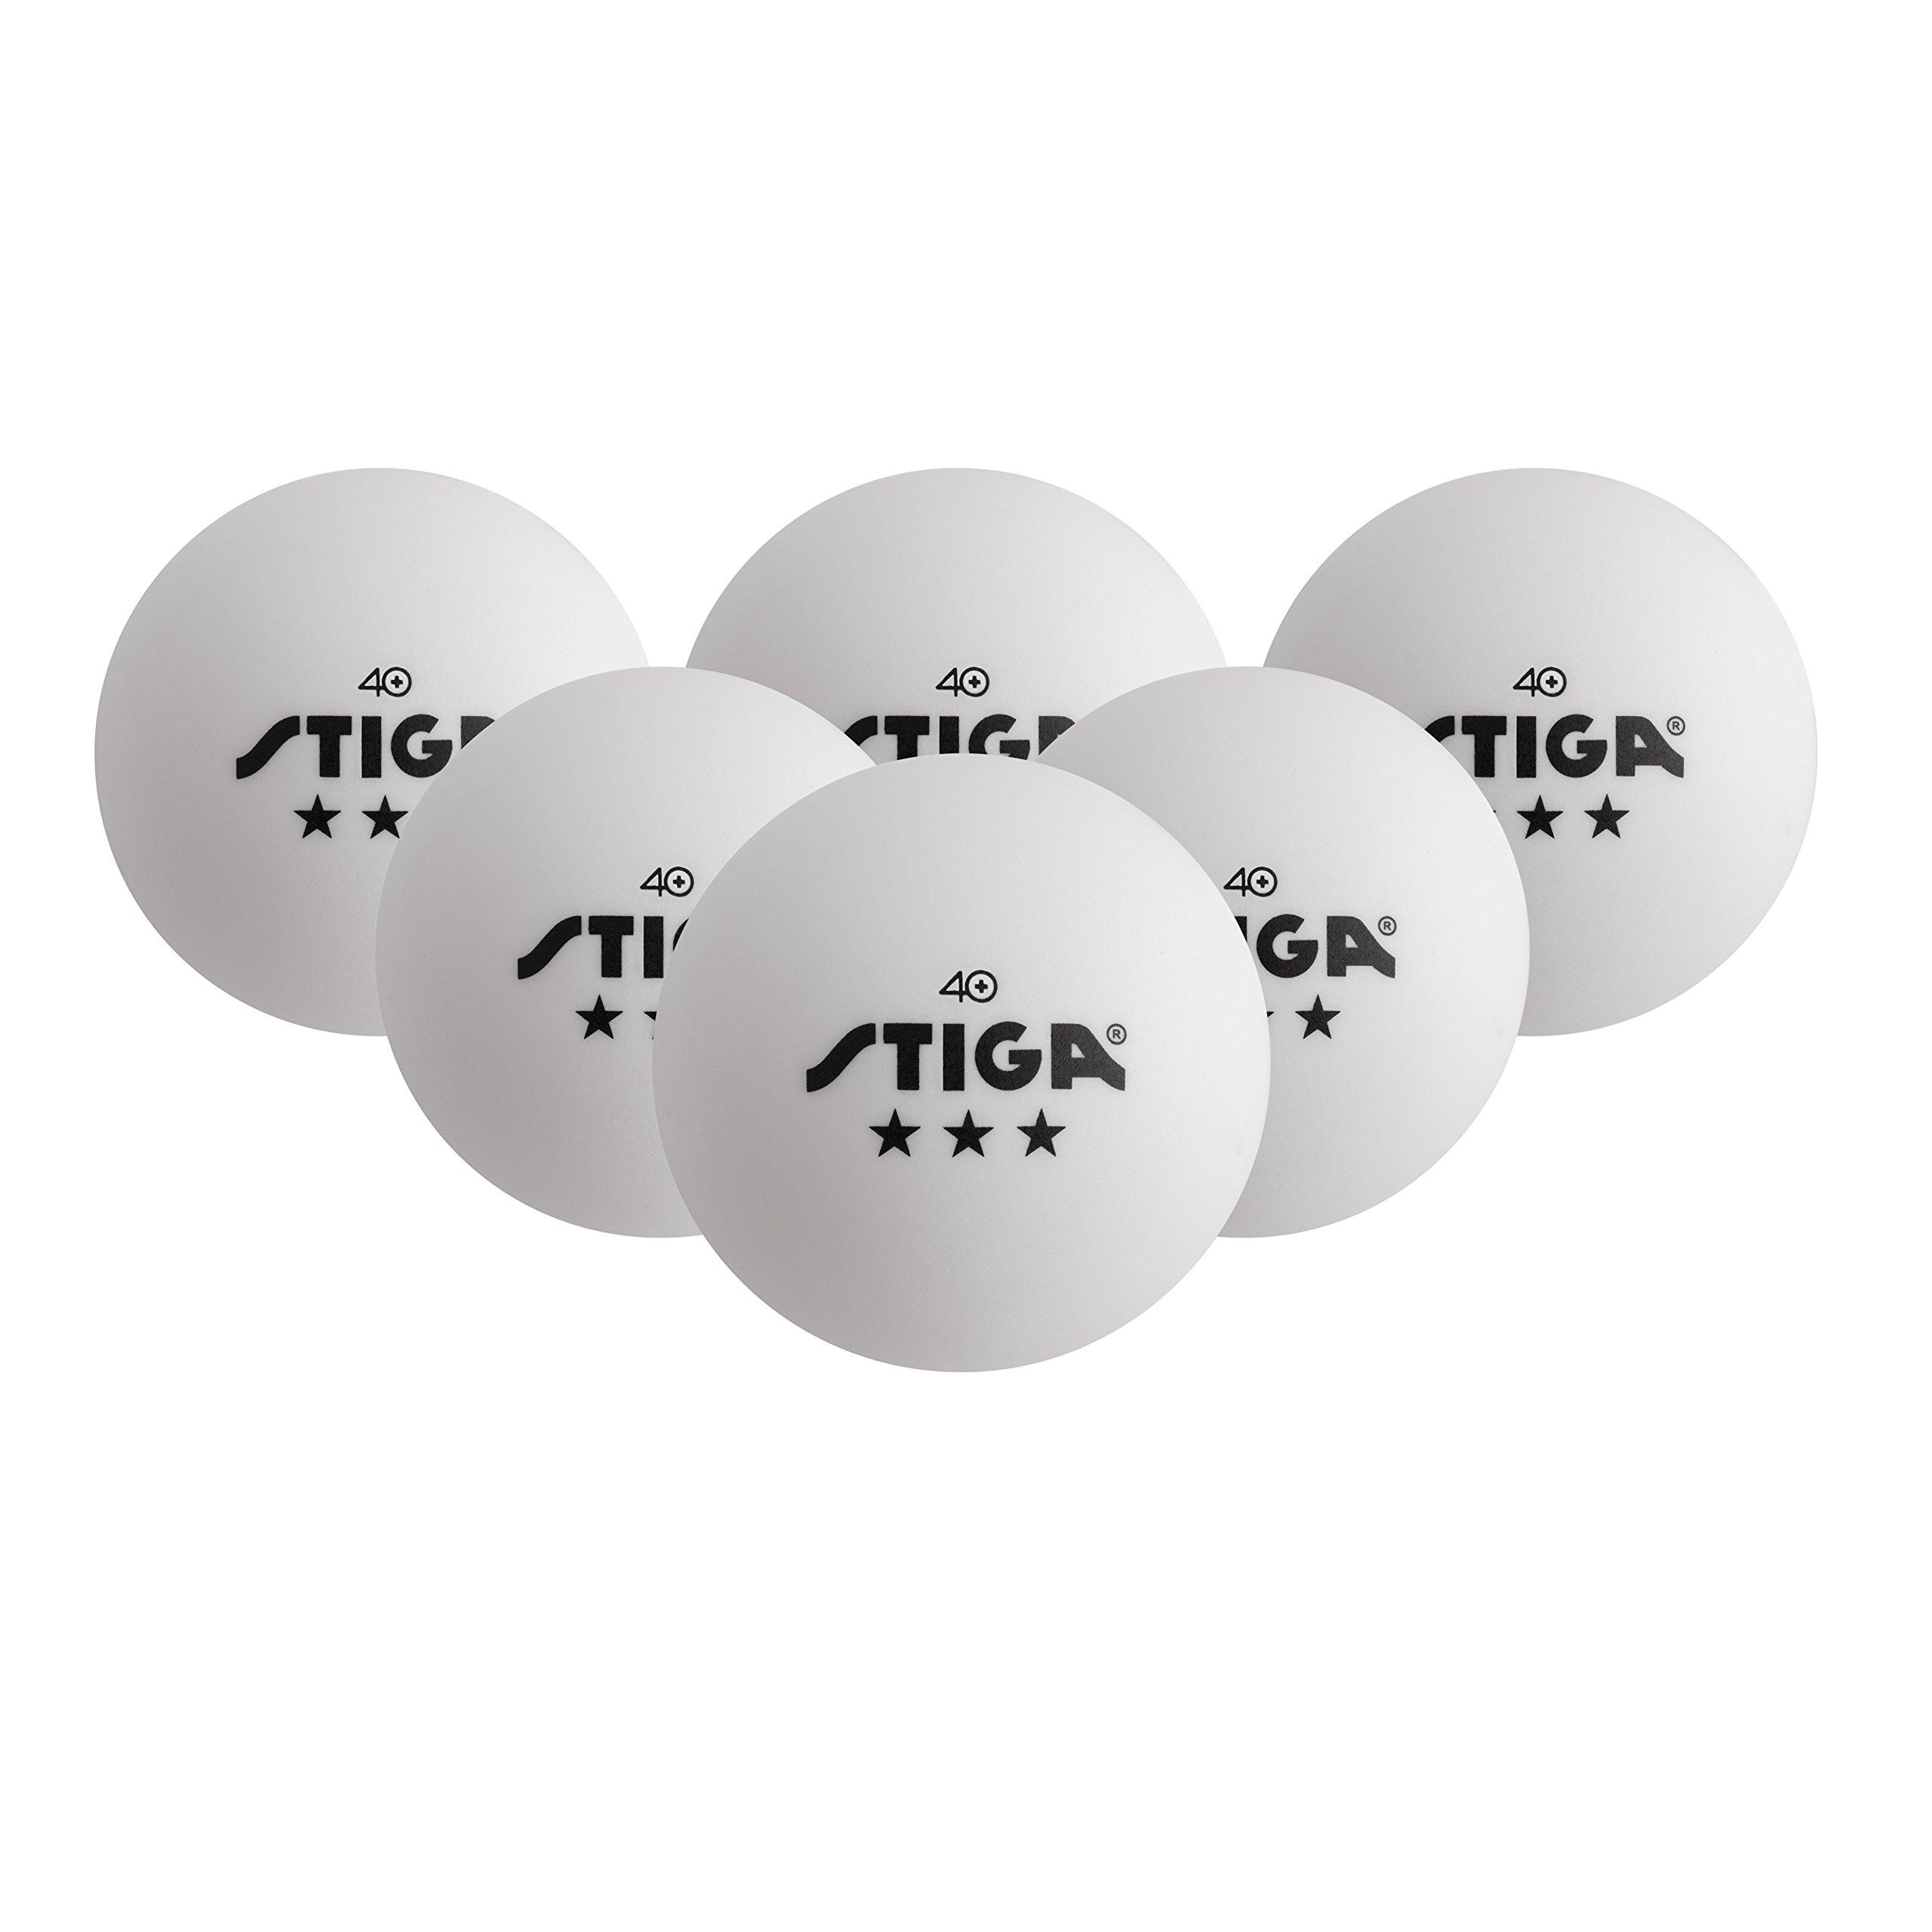 STIGA 3-Star Superior-Quality White Table Tennis Balls for Tournament Play (6-Pack) (10197)